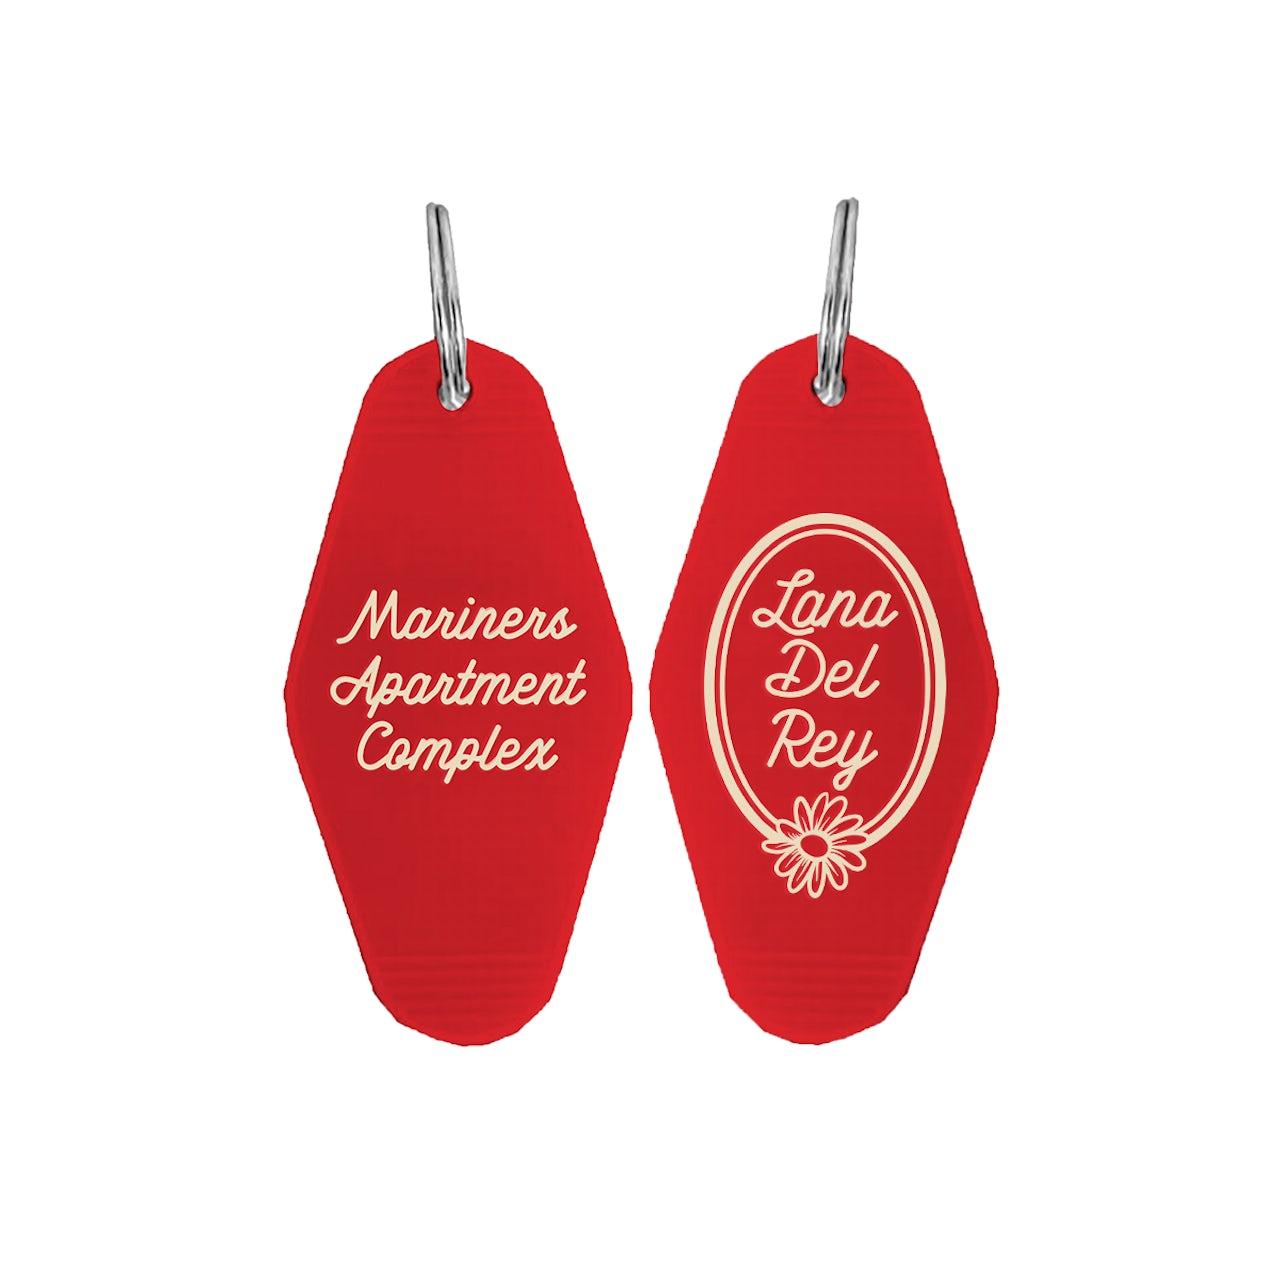 Lana Del Rey Mariners Apartment Complex Keychain